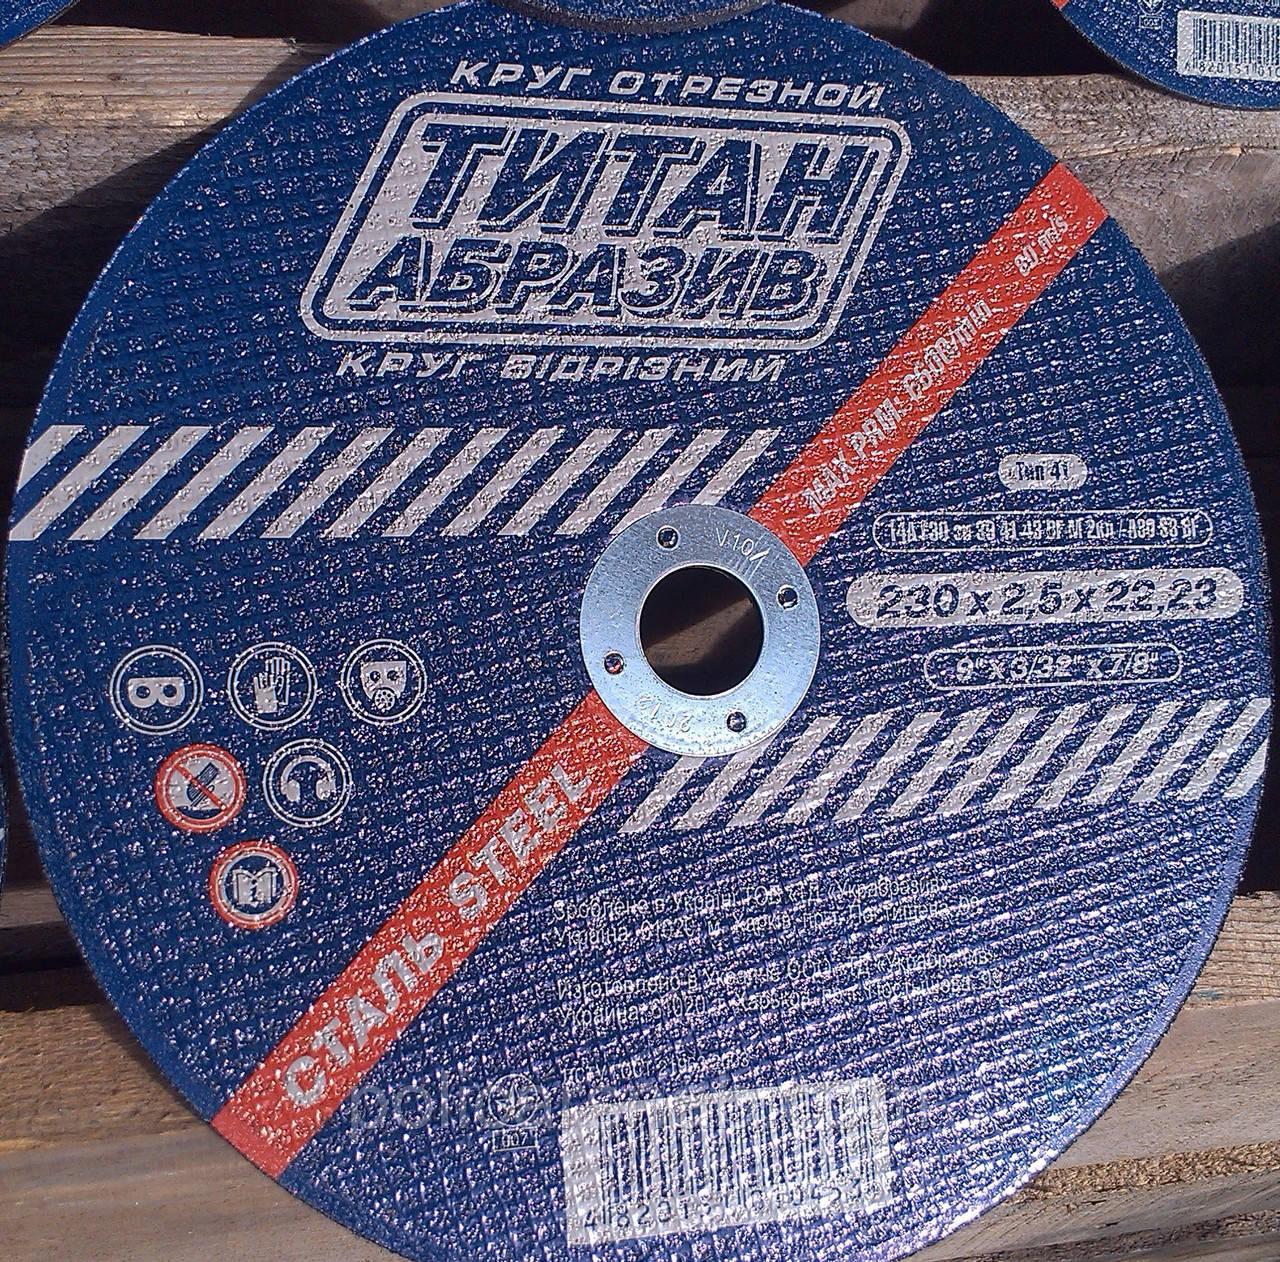 Круг отрезной по металлу Титан Абразив 230х2,5х22 - ТОВ «ПОЛІКАРСНАБ» в Житомире